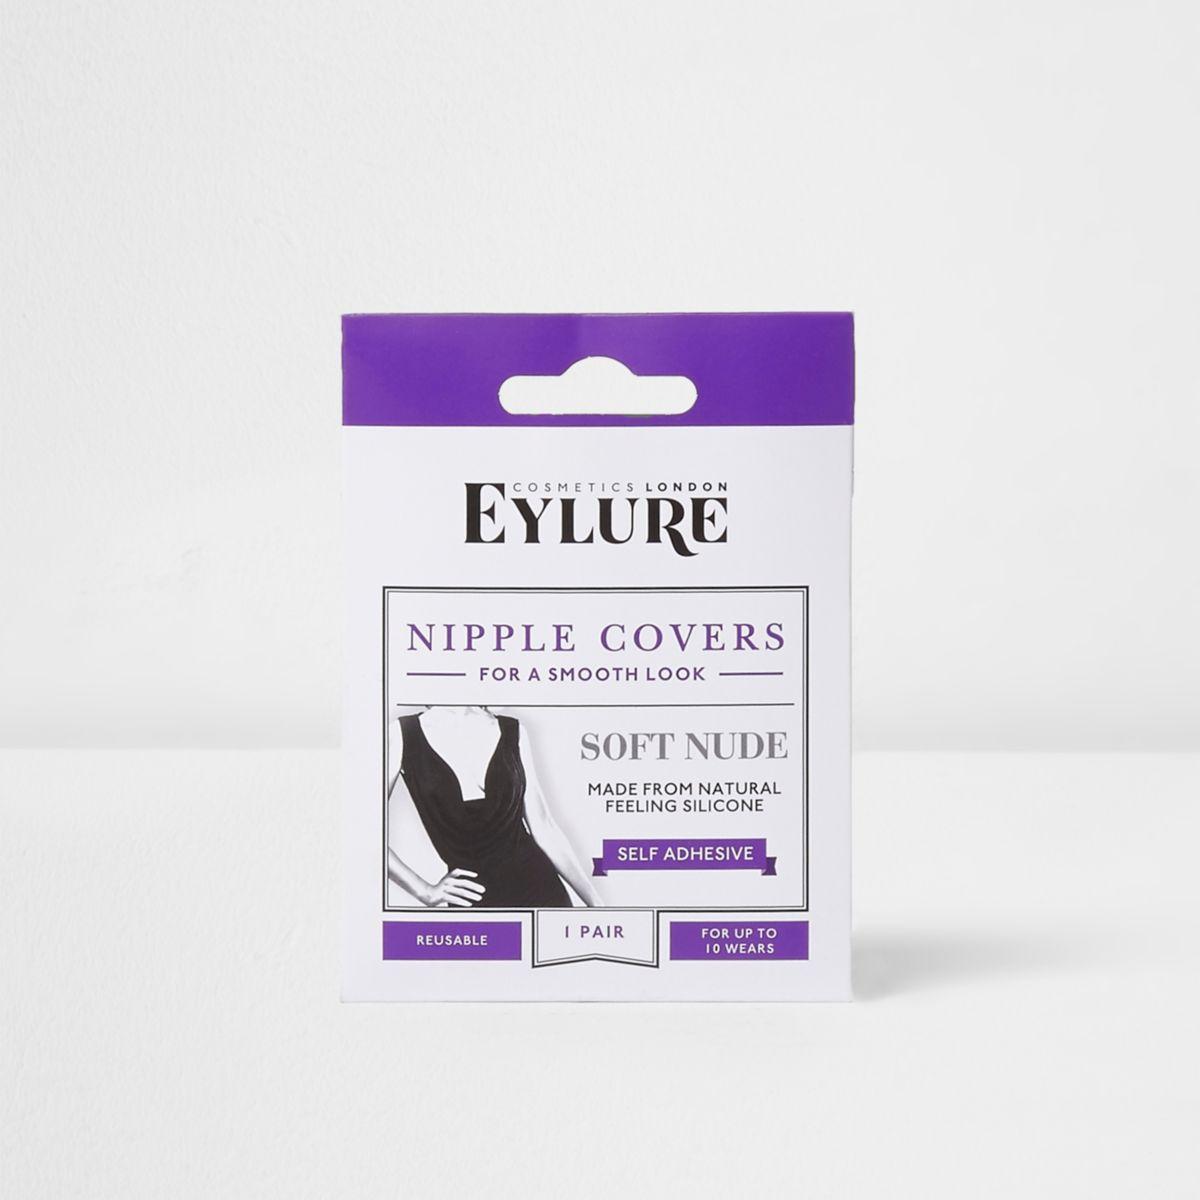 Eylure nipple covers